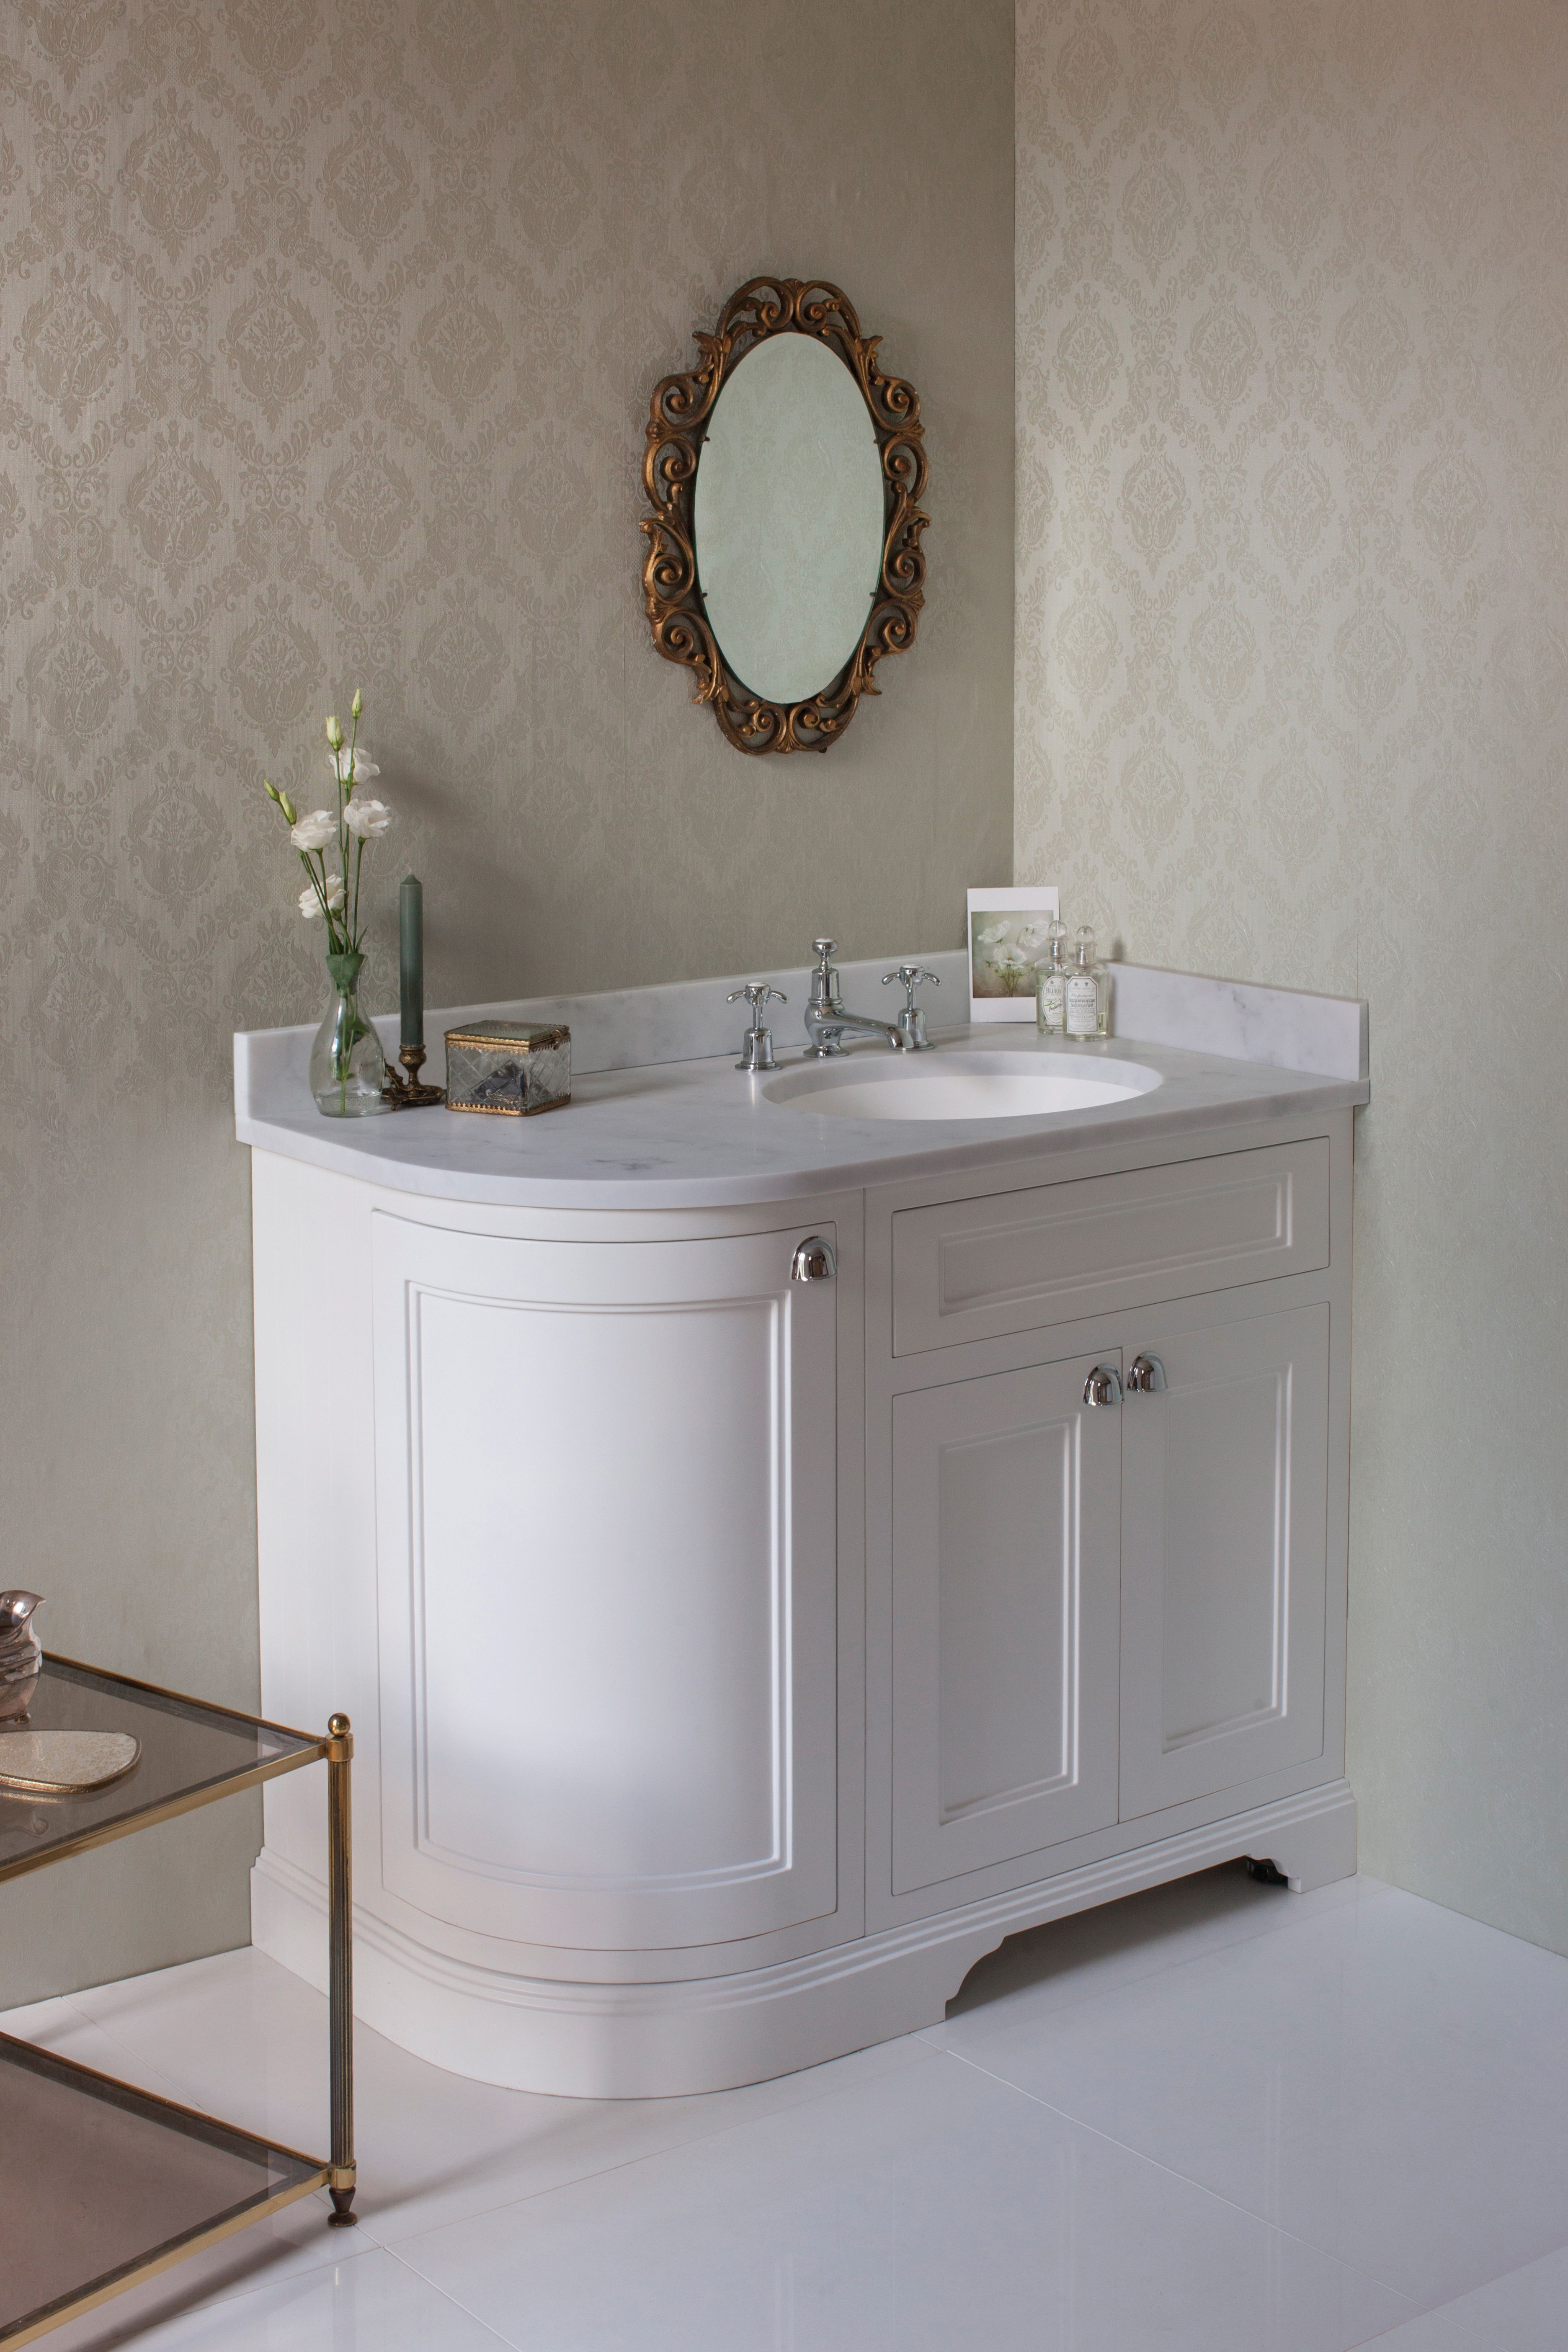 Burlington Bathrooms Freestanding 100 Curved Corner Vanity Unit Right Hand Matt White And Minerva Carr Corner Vanity Unit Bathroom Freestanding Corner Vanity